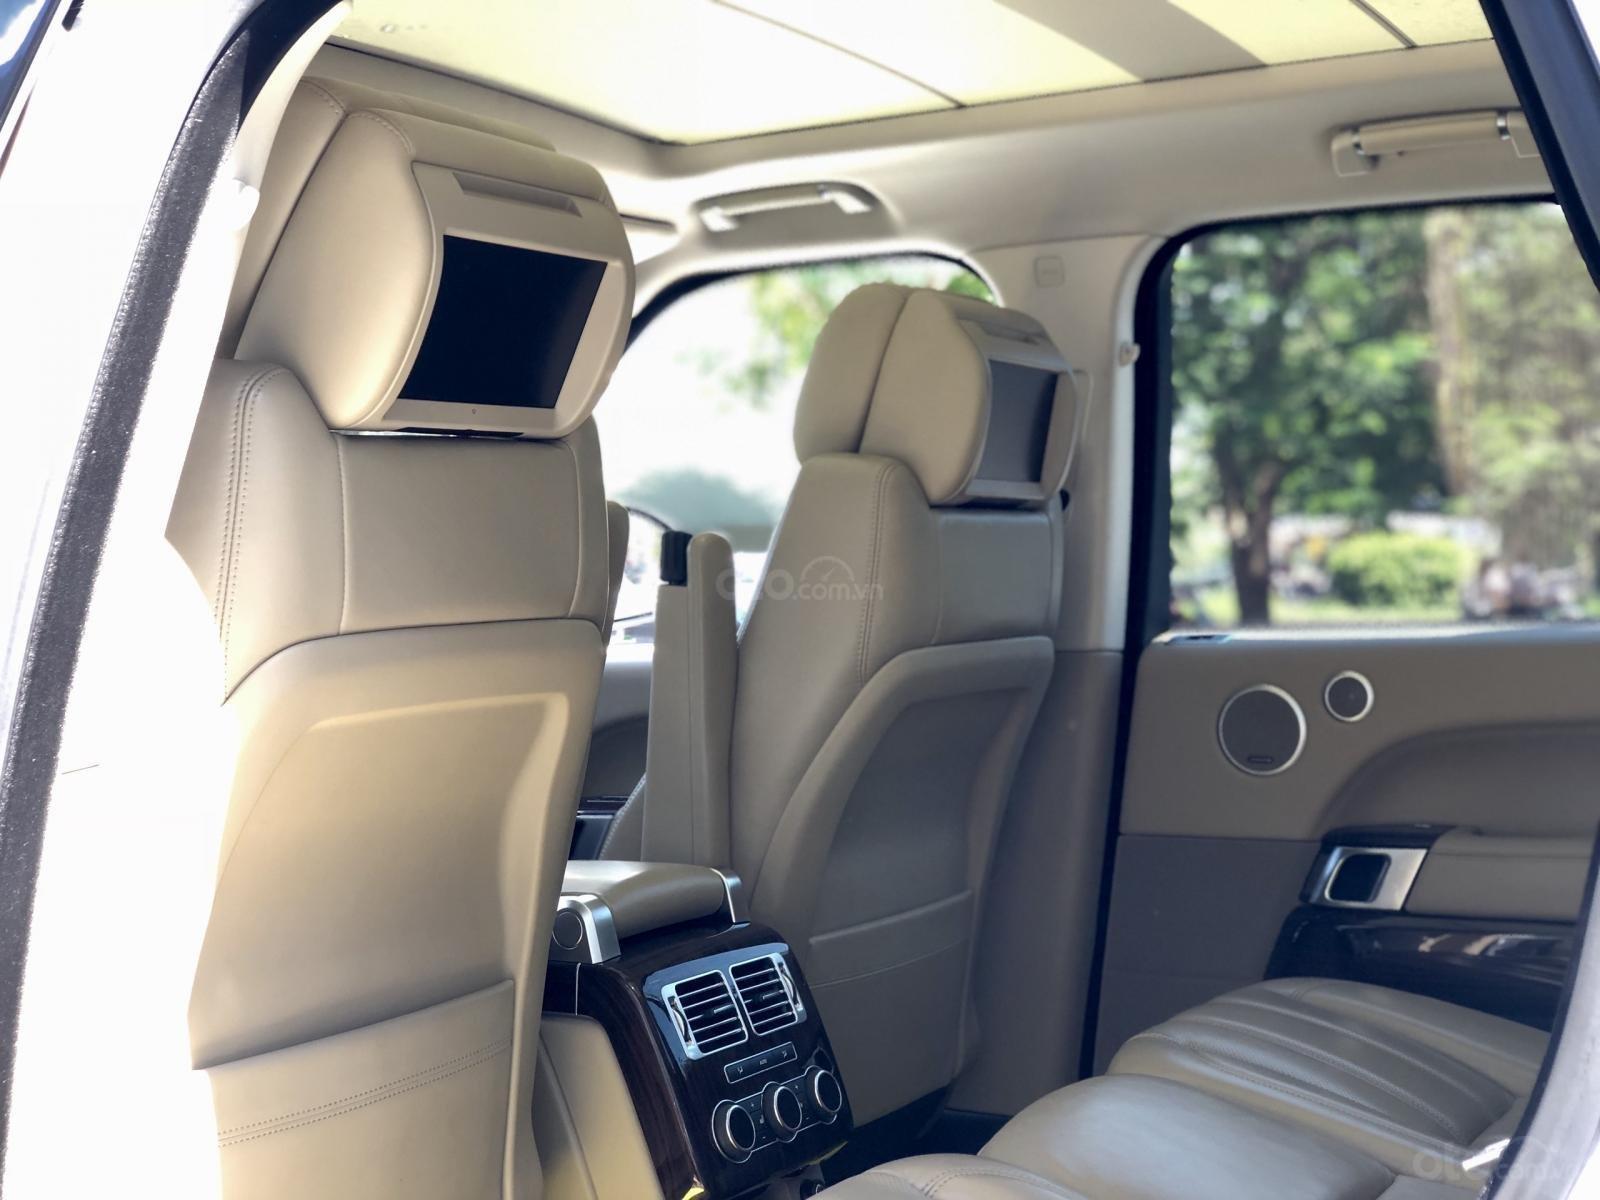 Bán Range Rover HSE 3.0 SX 2016 - Hotline 0945.39.2468 Ms Hương (18)